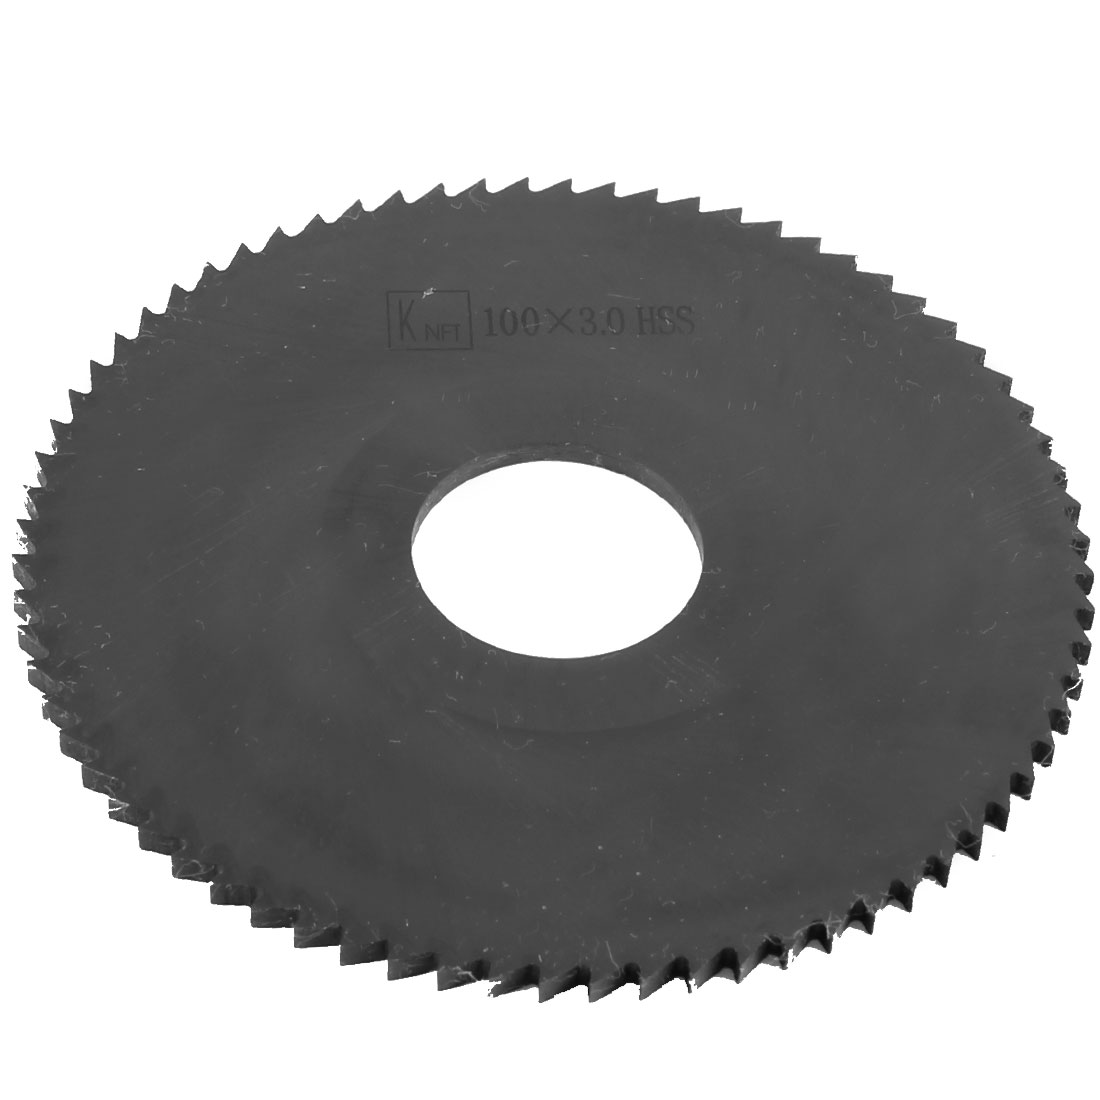 Hand Tool 100mm x 27mm x 3mm 72 Peg Teeth HSS Slitting Saw Cutter